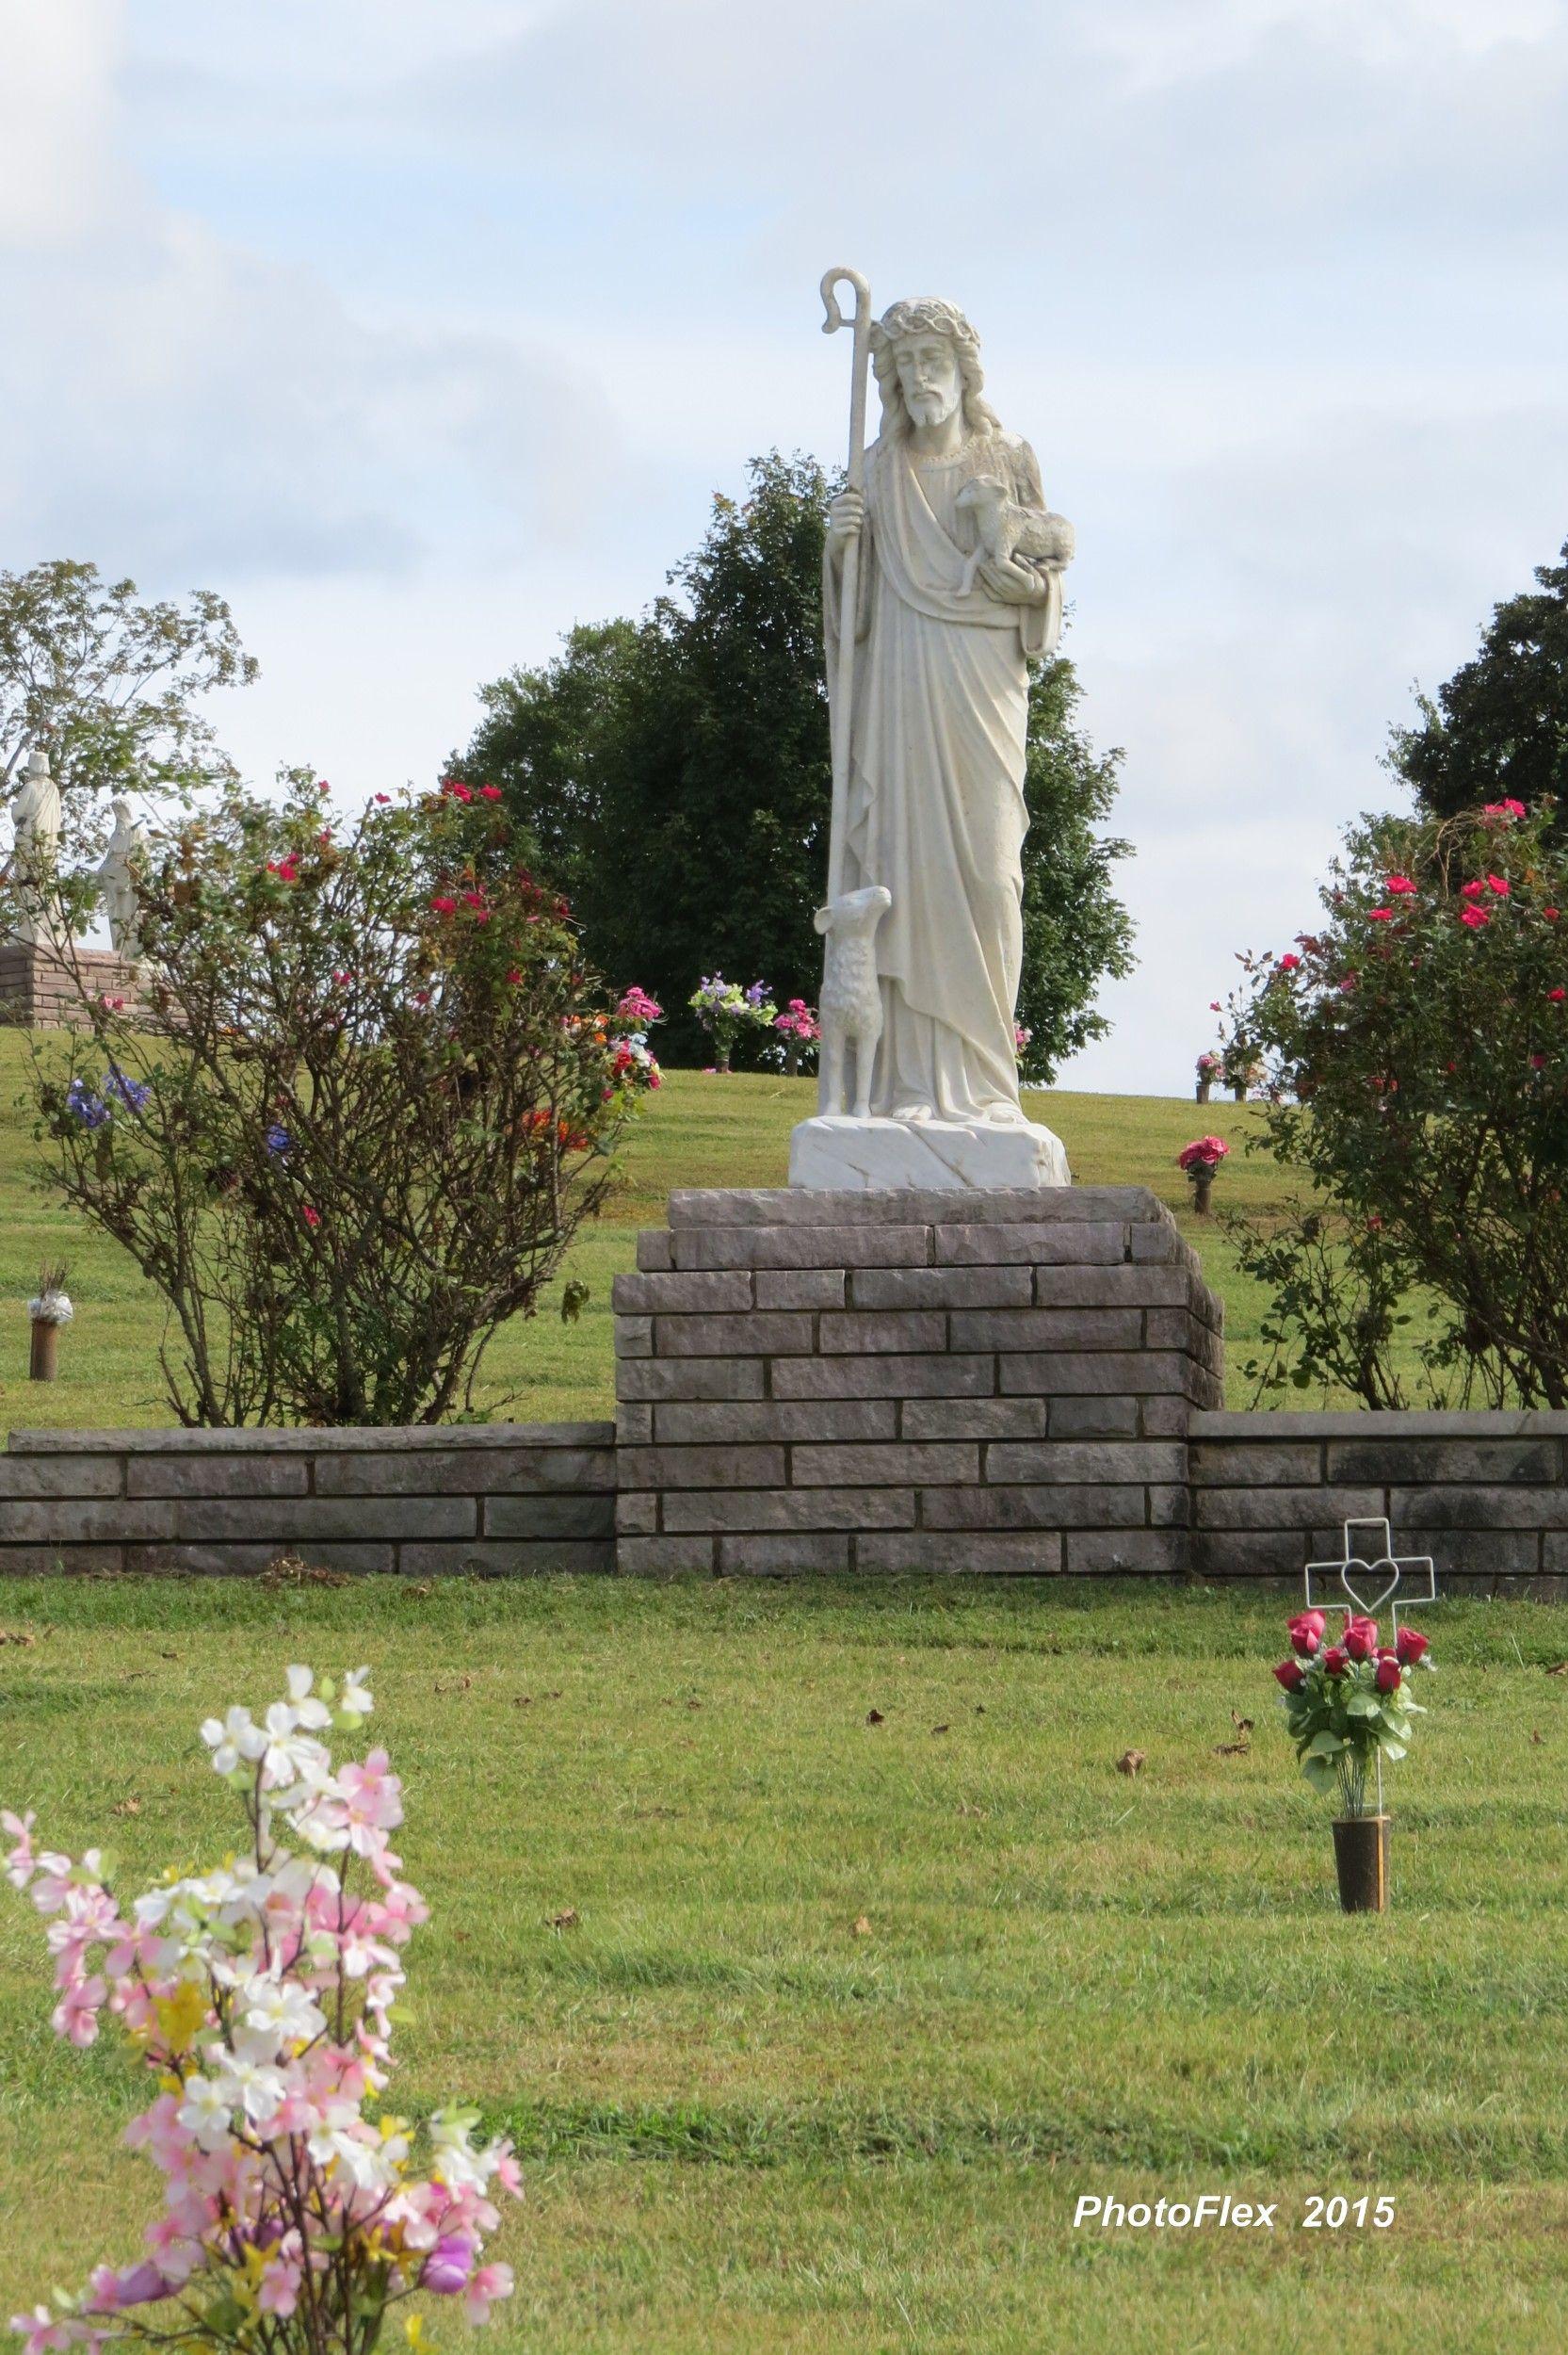 Good shepherd funeral home rome ga - Berry Highland Memorial Cemetery Knoxville Tn Garden Of The Good Shepherd